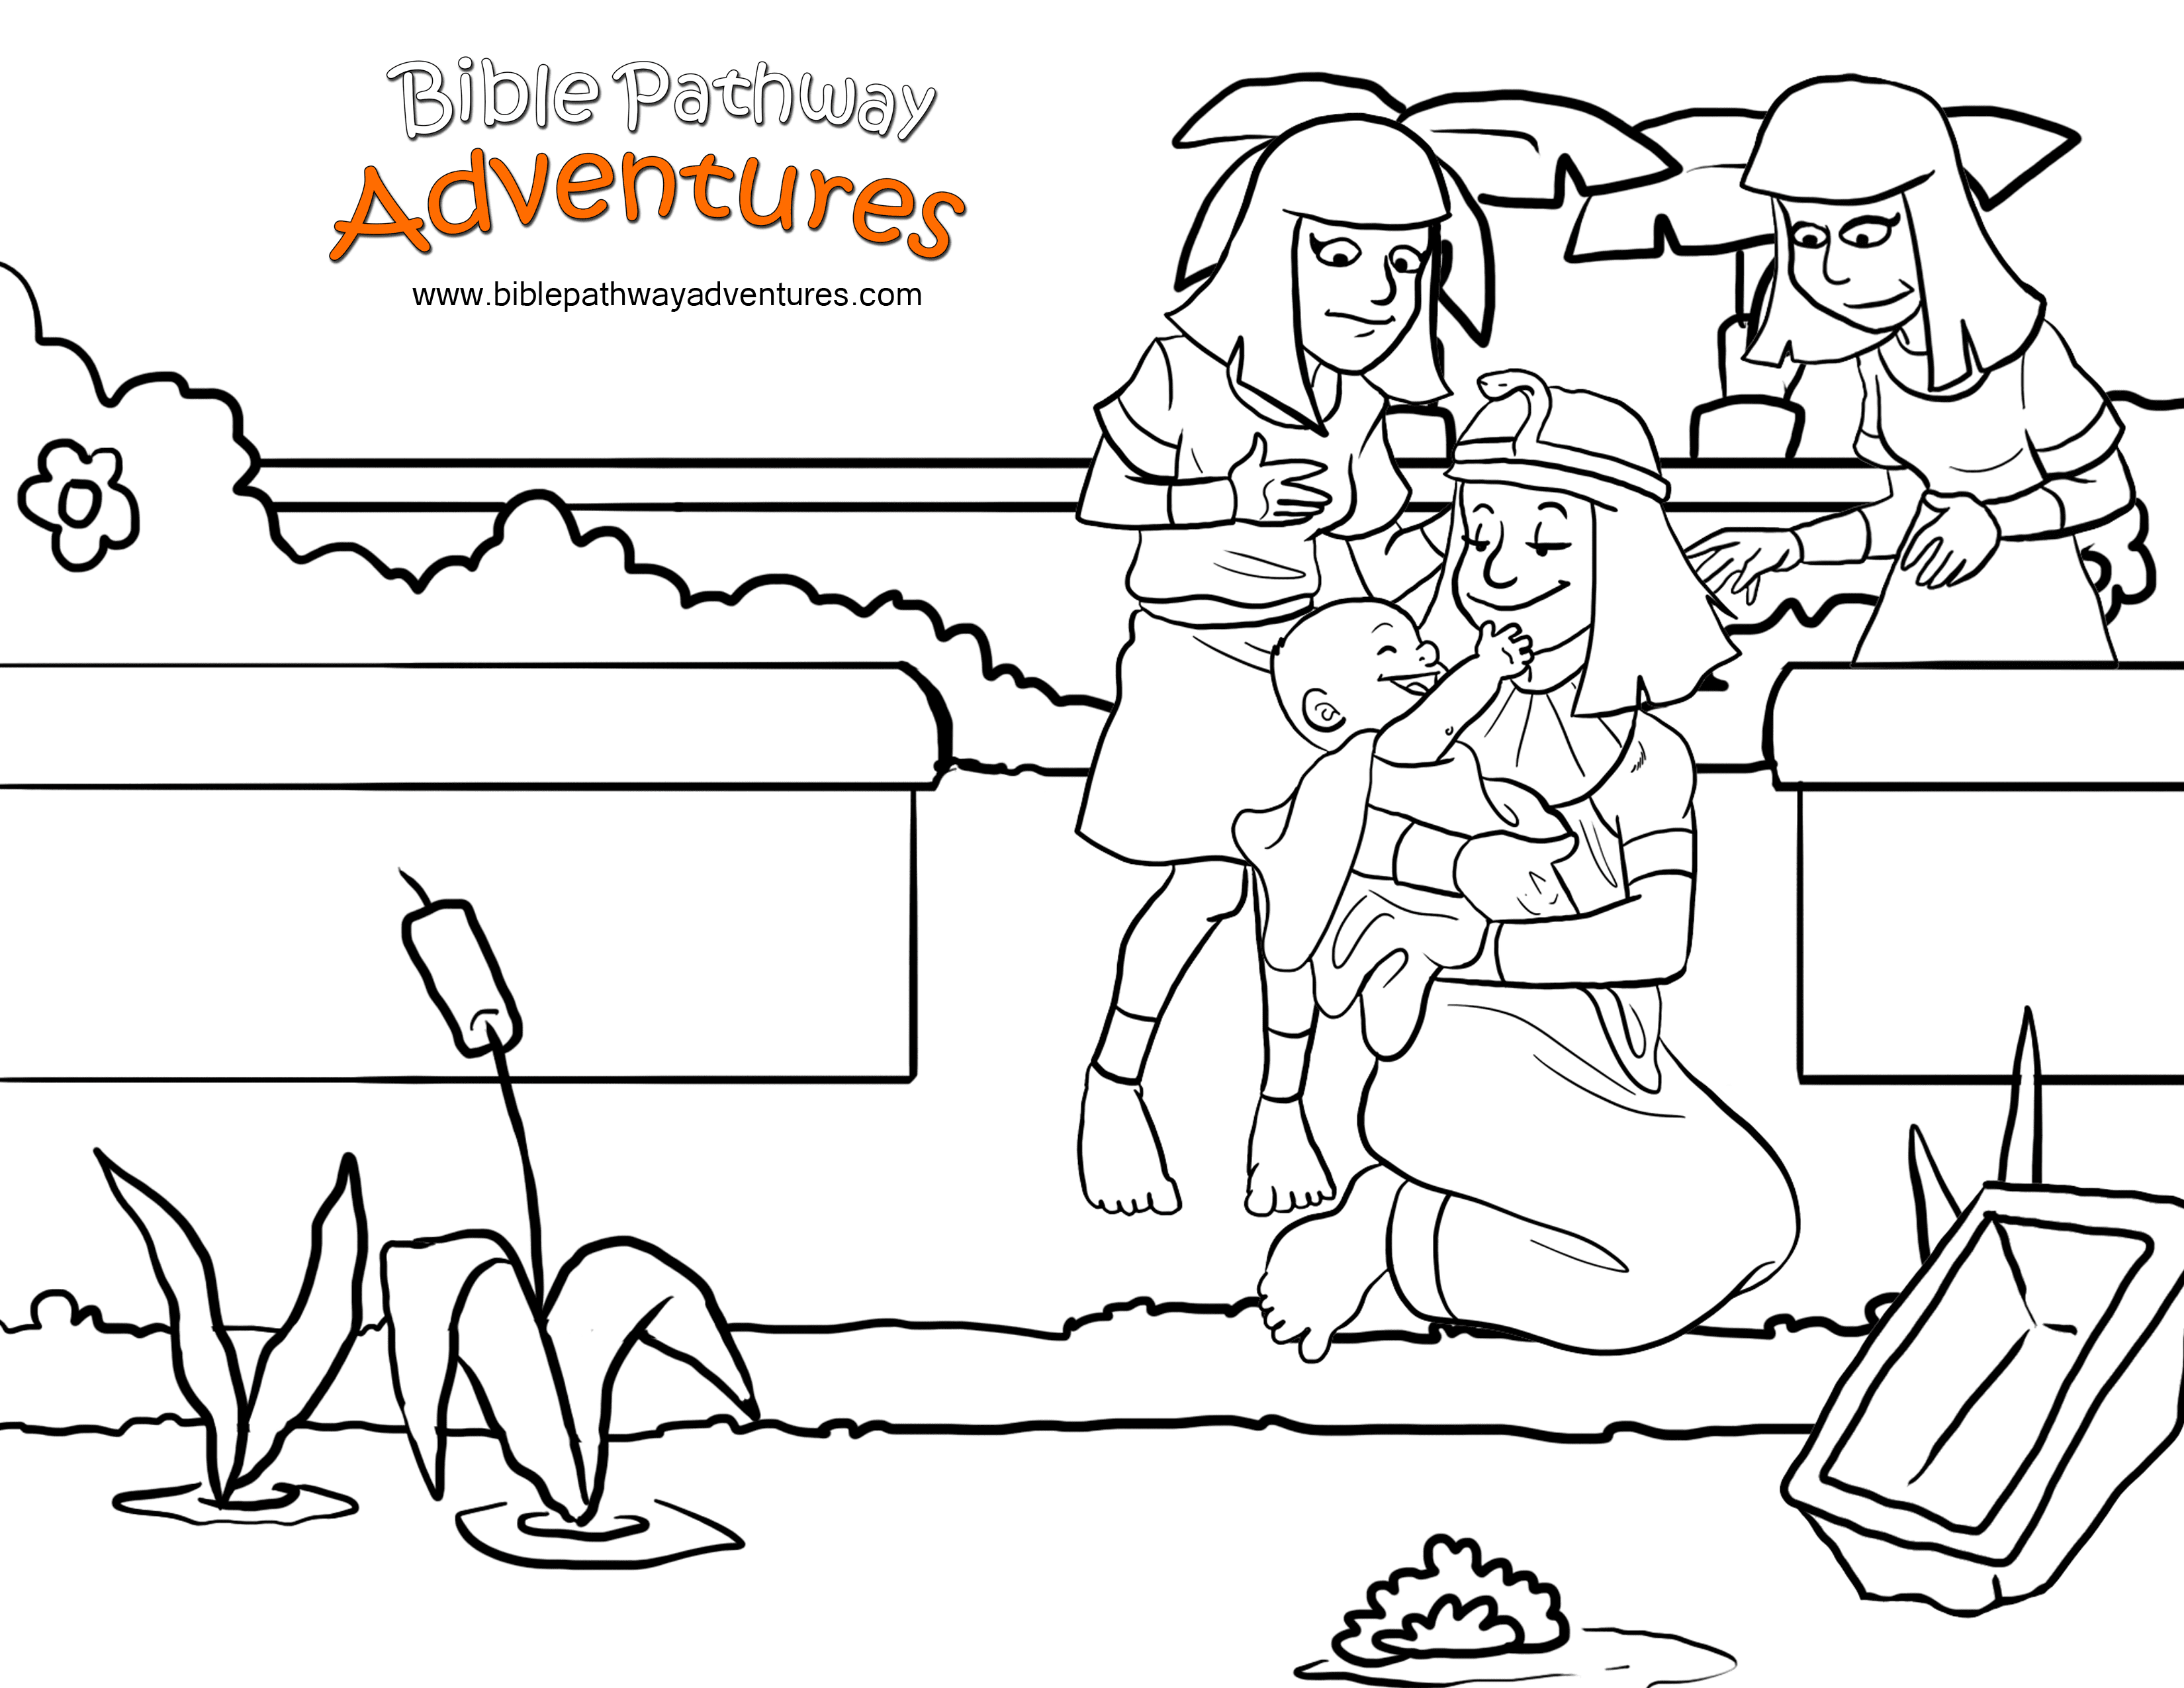 Enjoy Egyptian Heroes through the Casumo adventure!